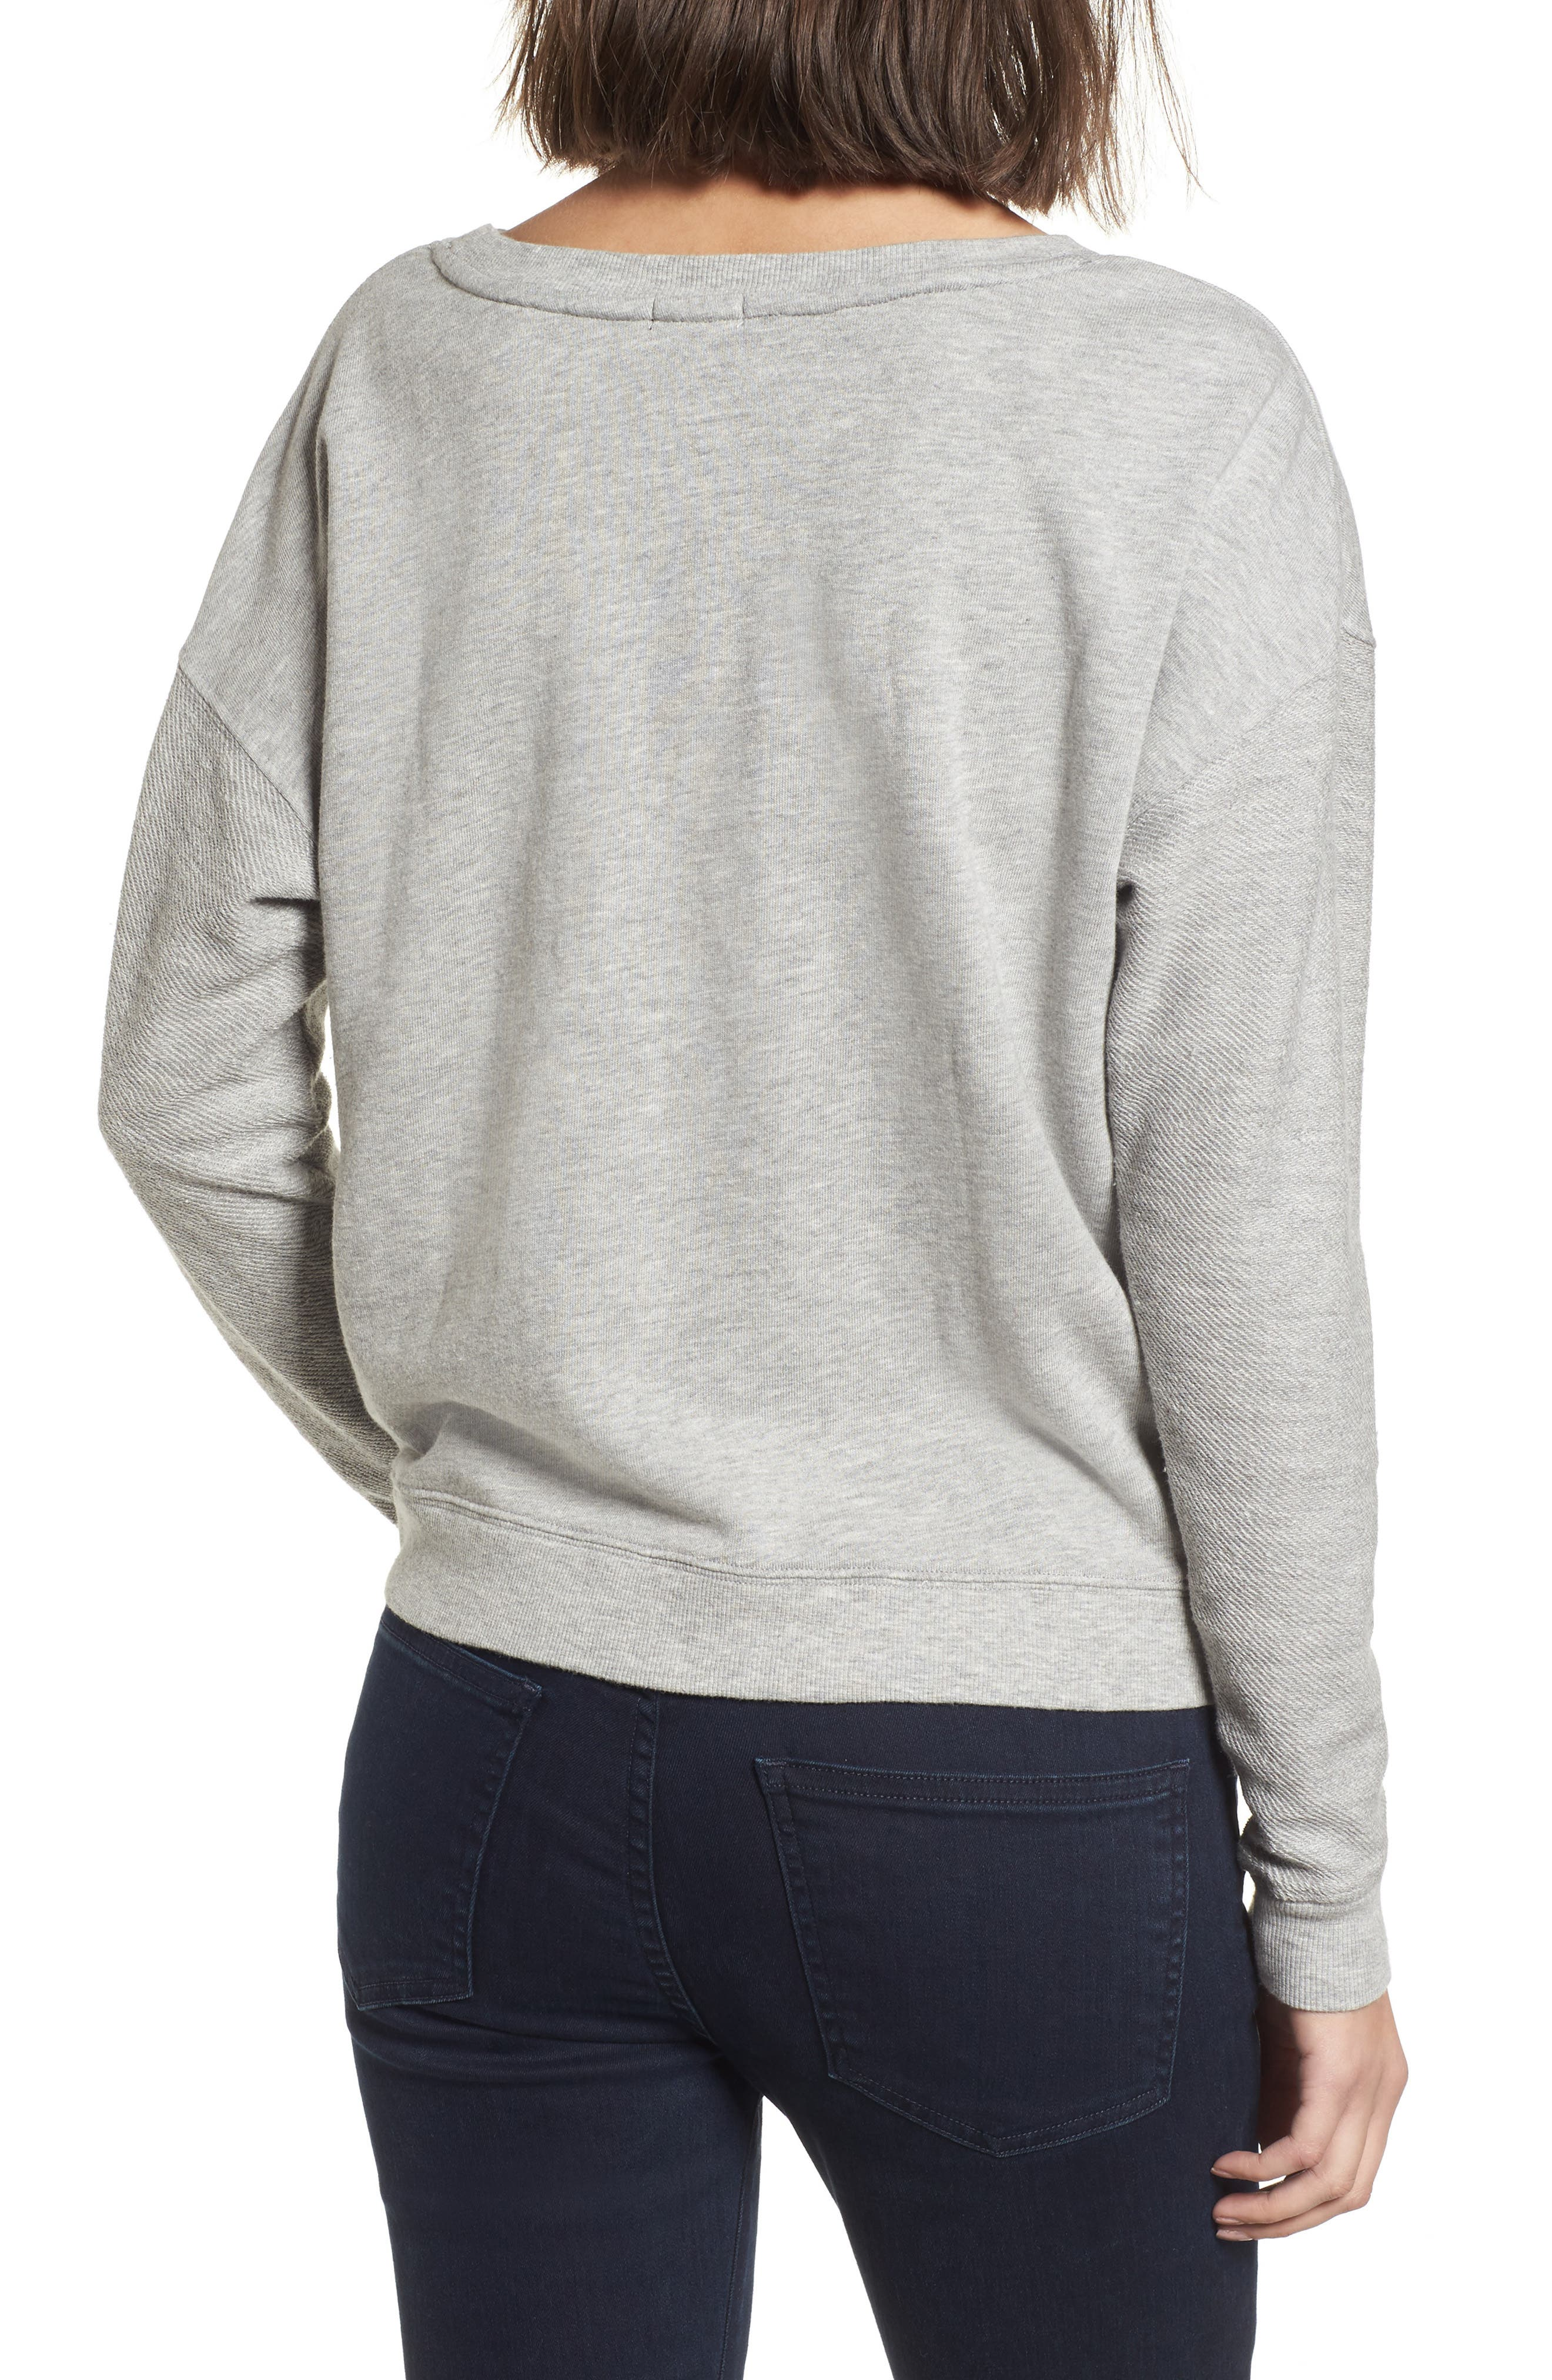 Kelli Paris Sweatshirt,                             Alternate thumbnail 2, color,                             032